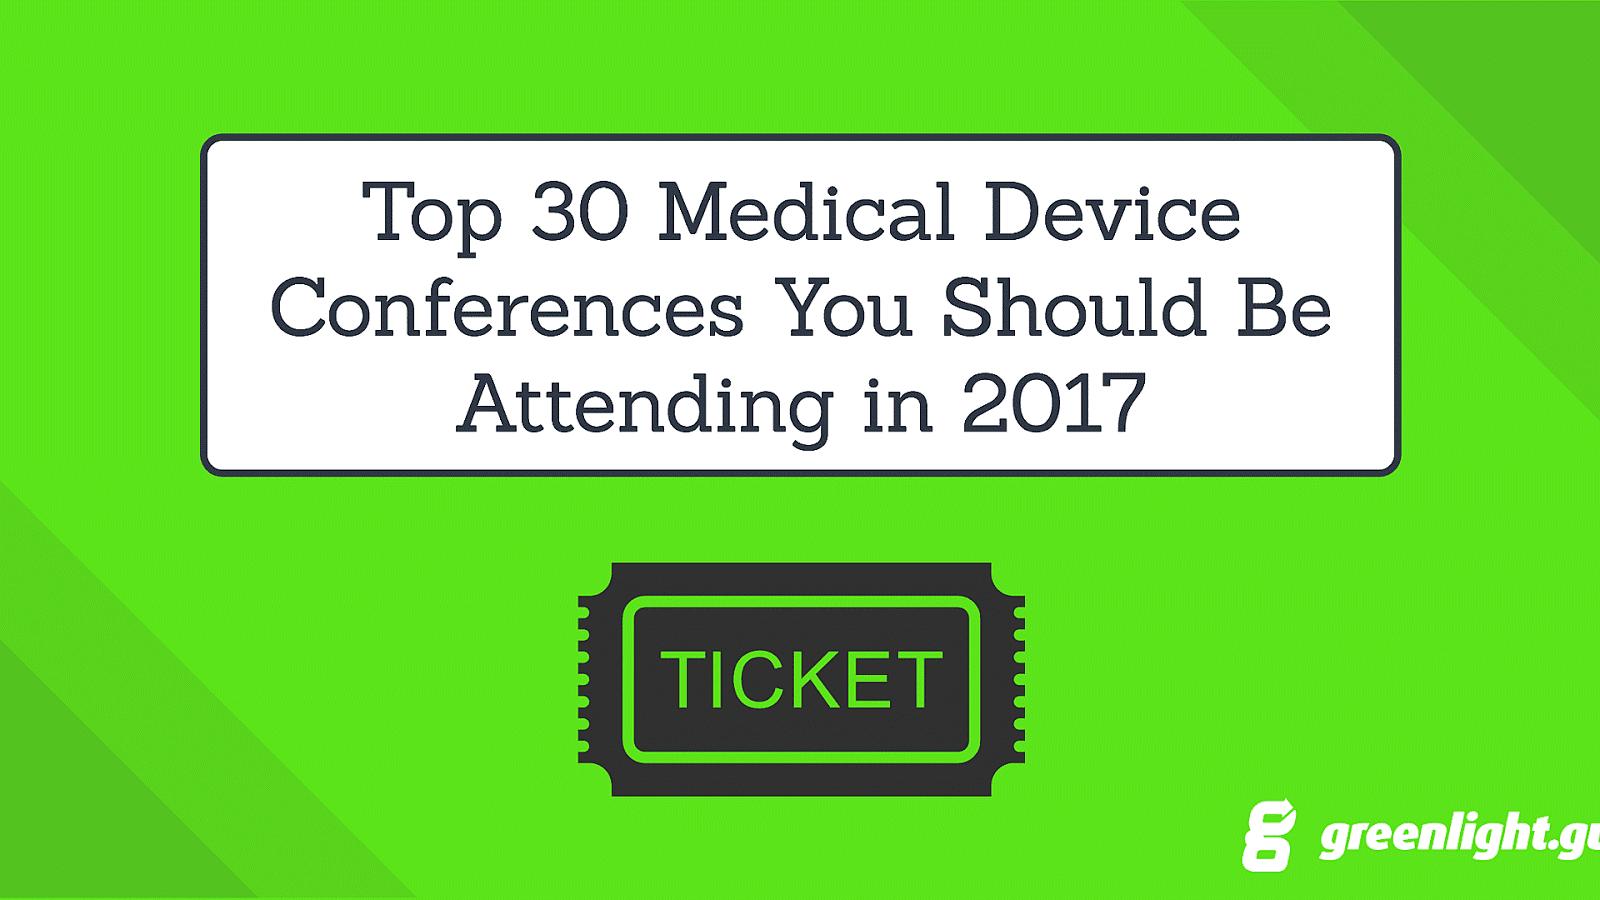 Top Medical Equipment Companies - Equipment Choices